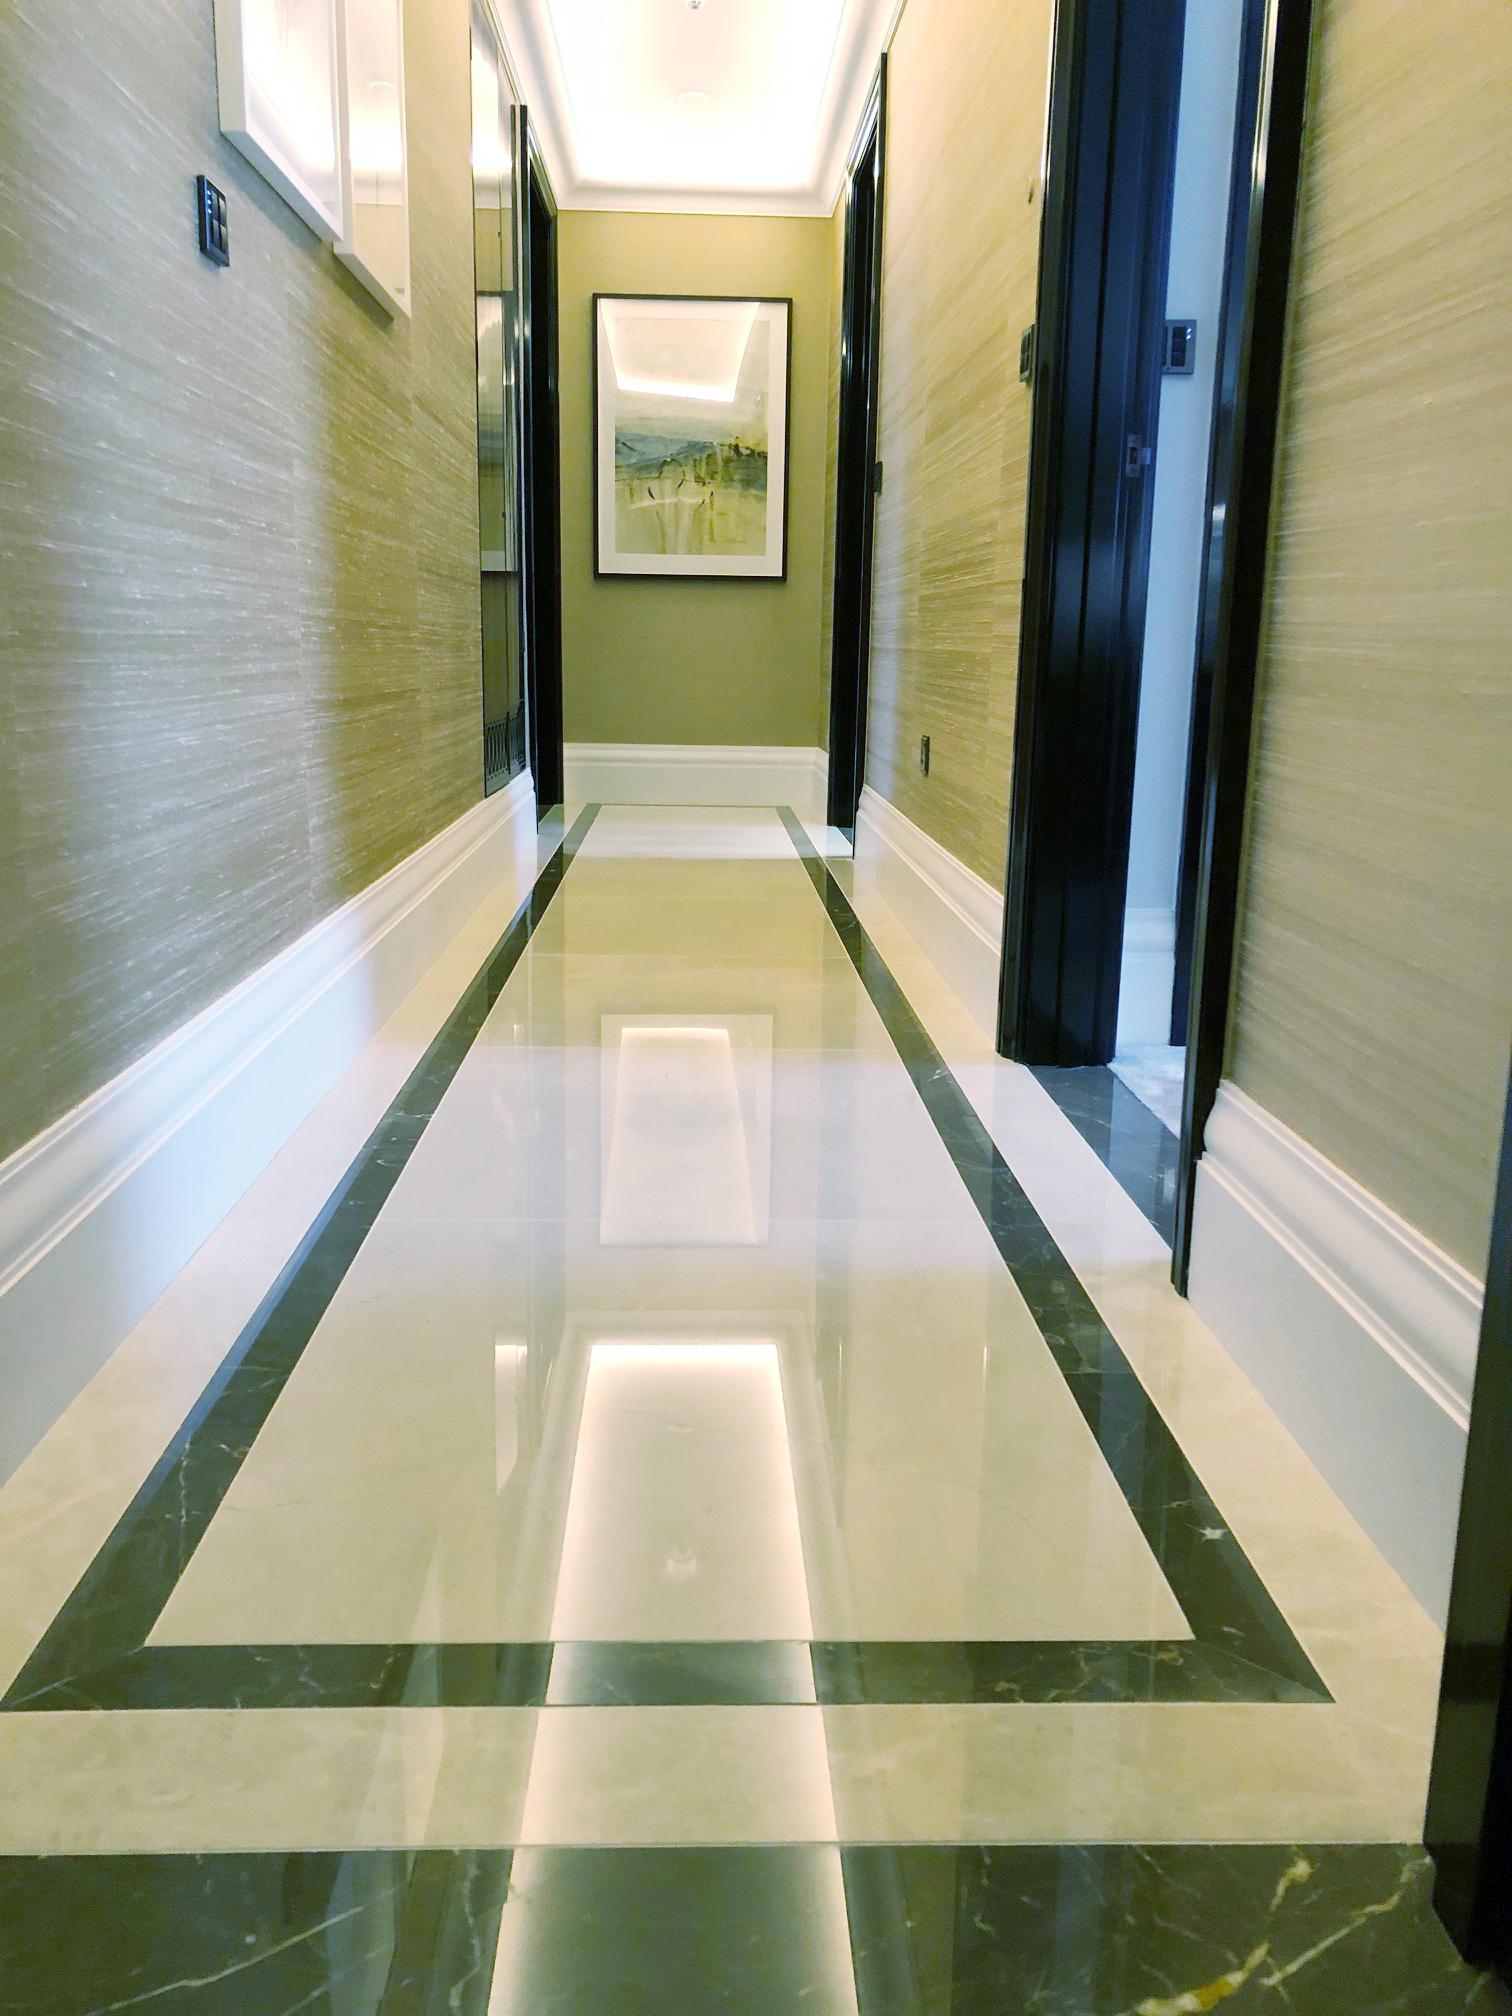 marble hallway after polishing